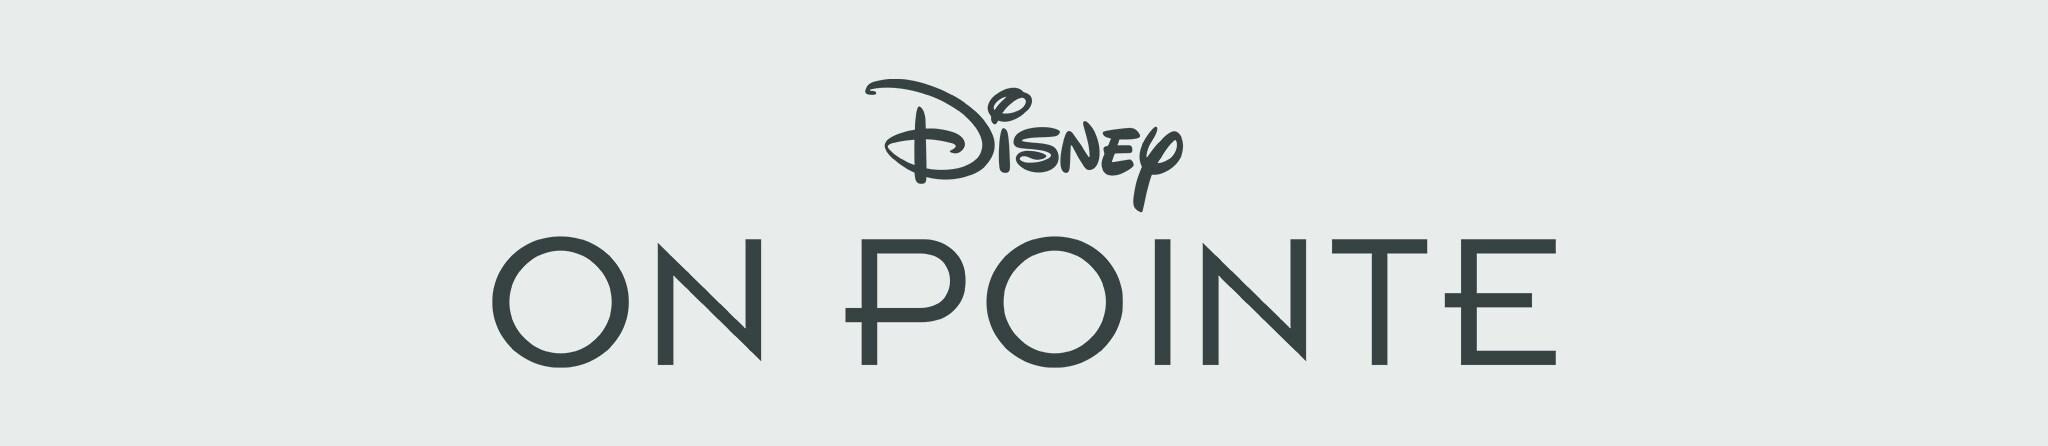 Disney | On Pointe